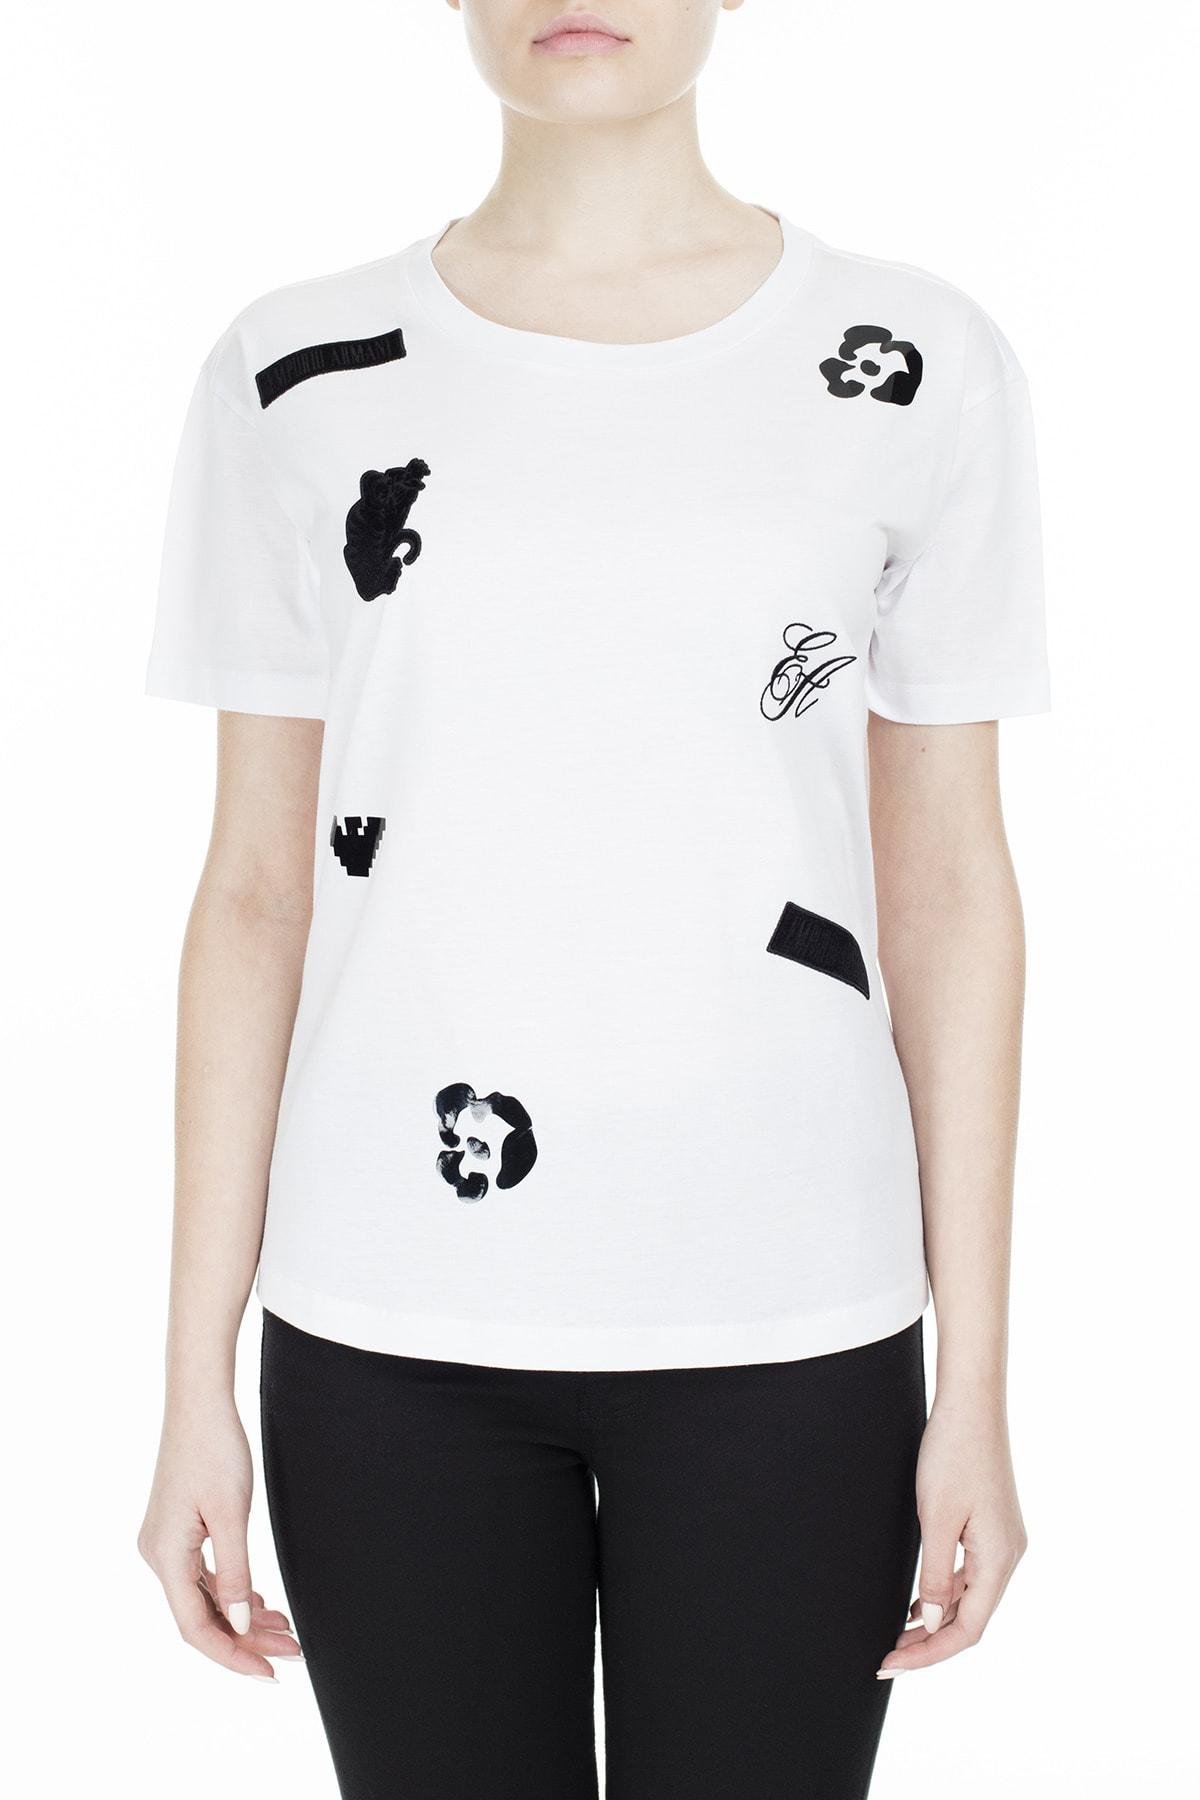 Emporio Armani Regular Fit T Shirt Kadın T Shirt S 6G2T7M 2J95Z 0100 S 6G2T7M 2J95Z 0100